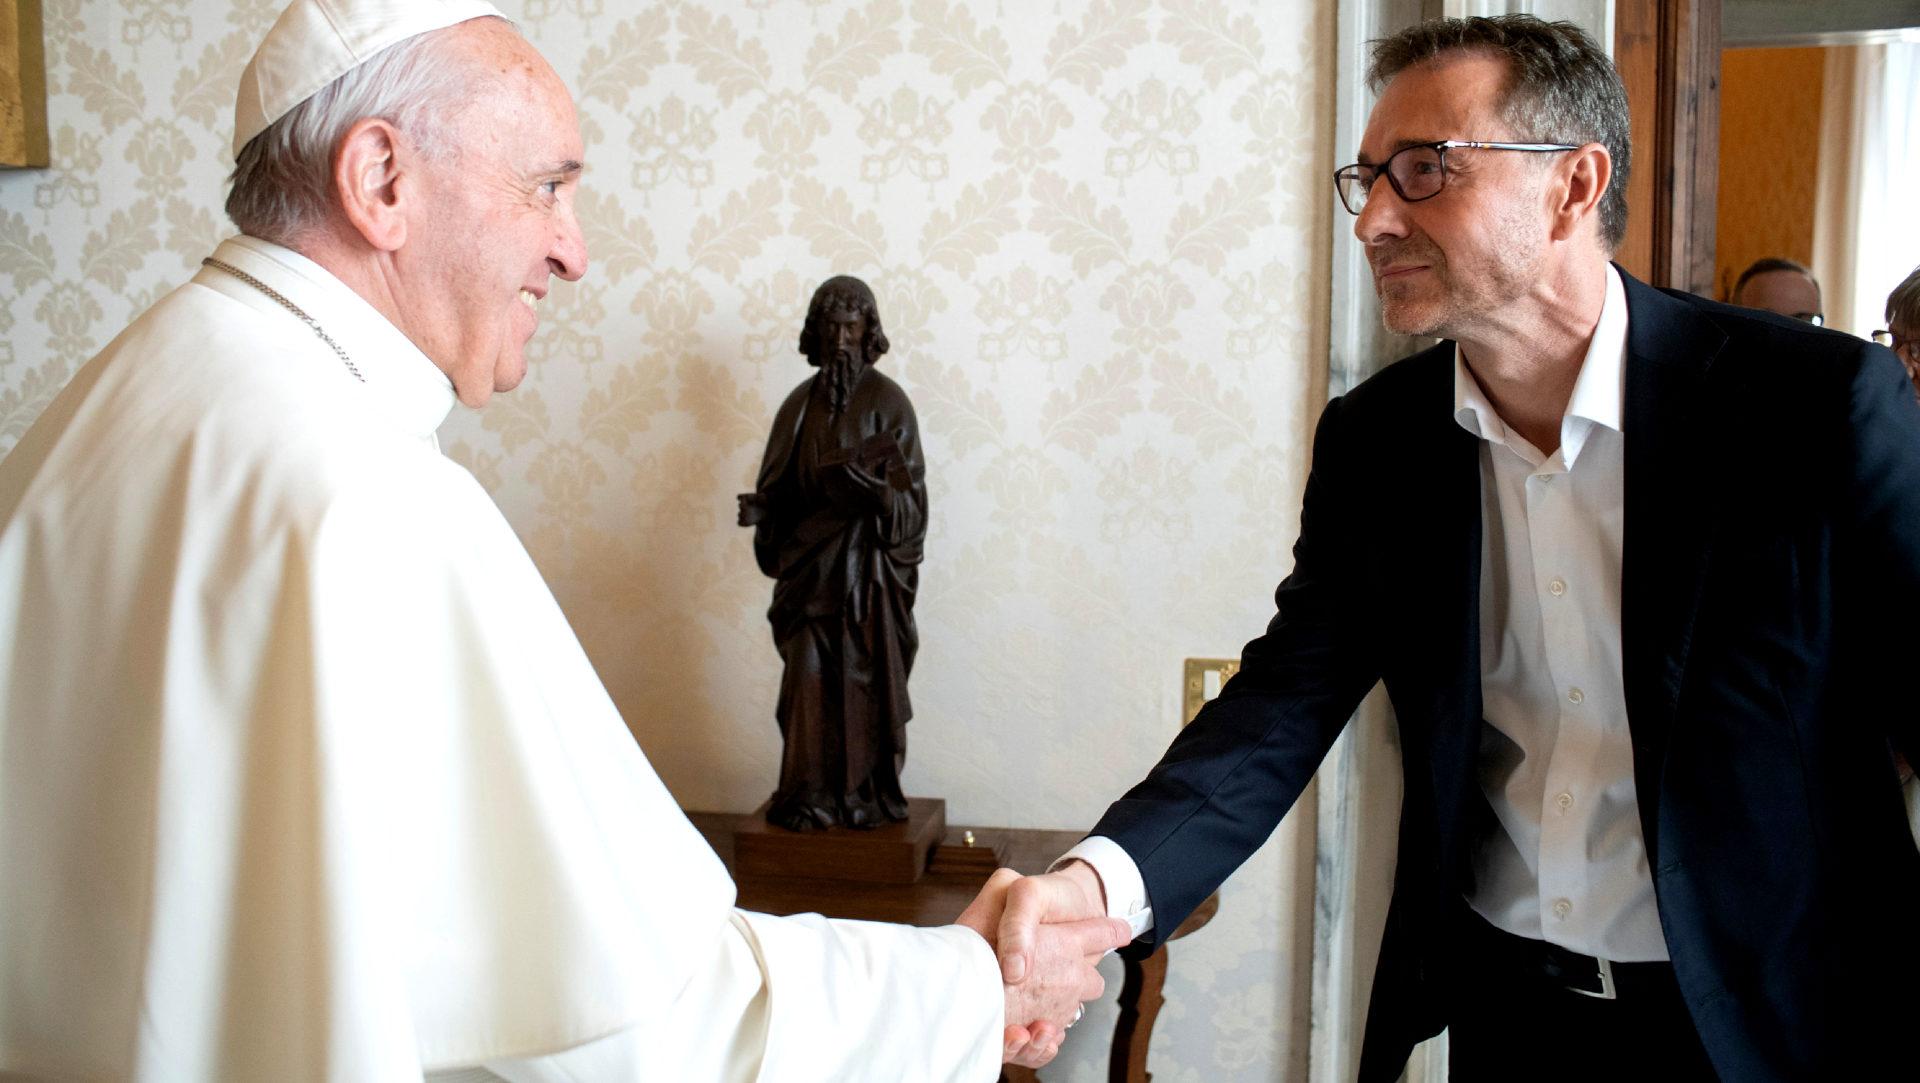 Guido Fluri (r.), Opfervertreter, bei Papst Franziskus |  © Servizio Fotografico - Vatican Media